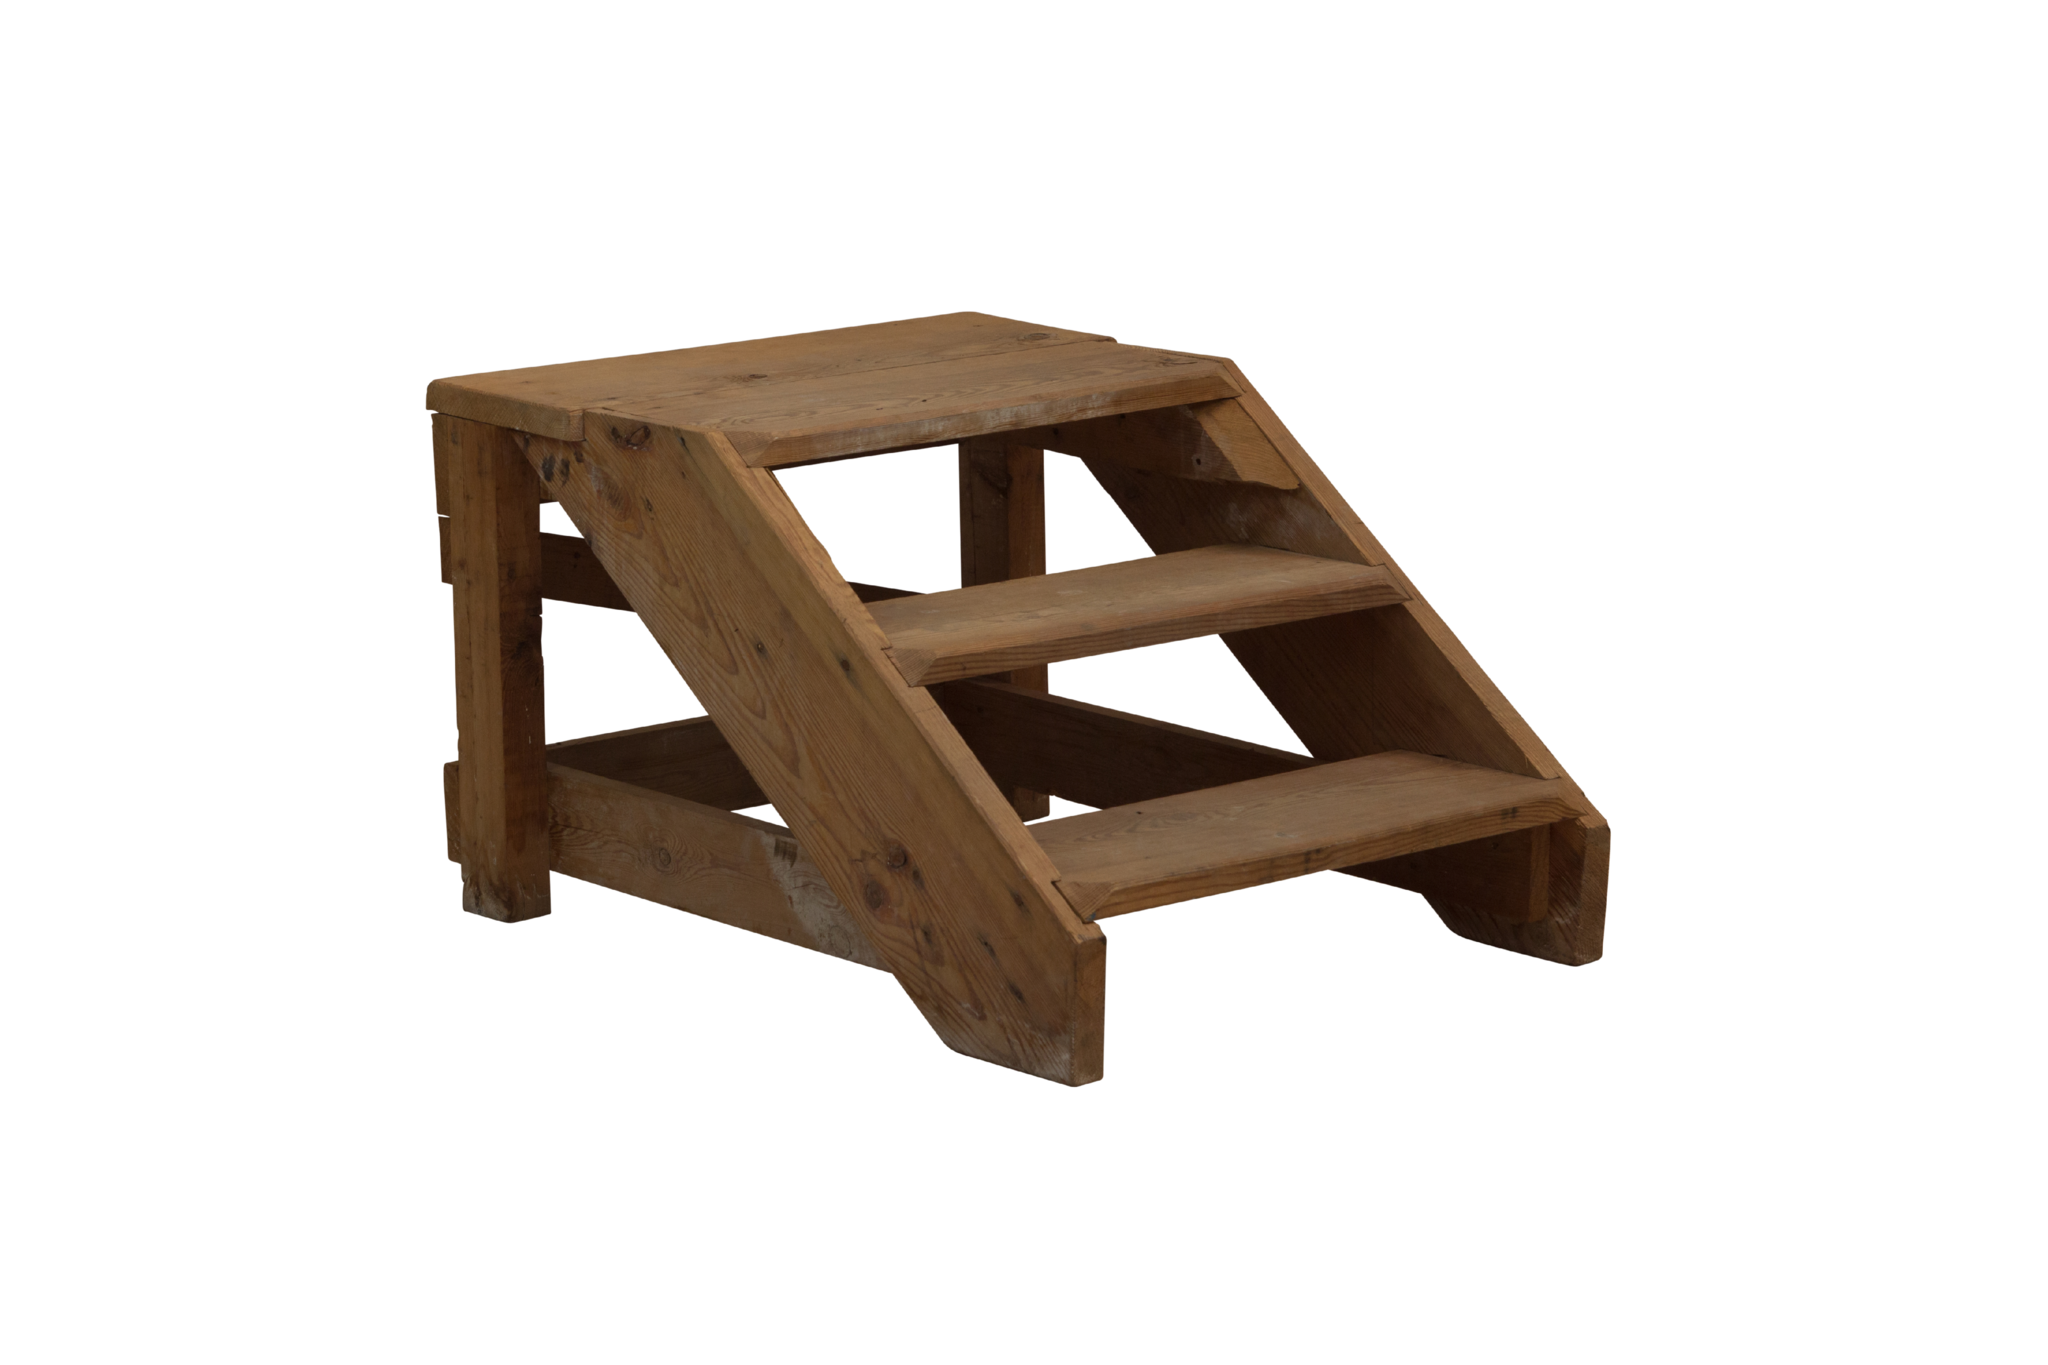 Kleine vintage houten boekenkast trap